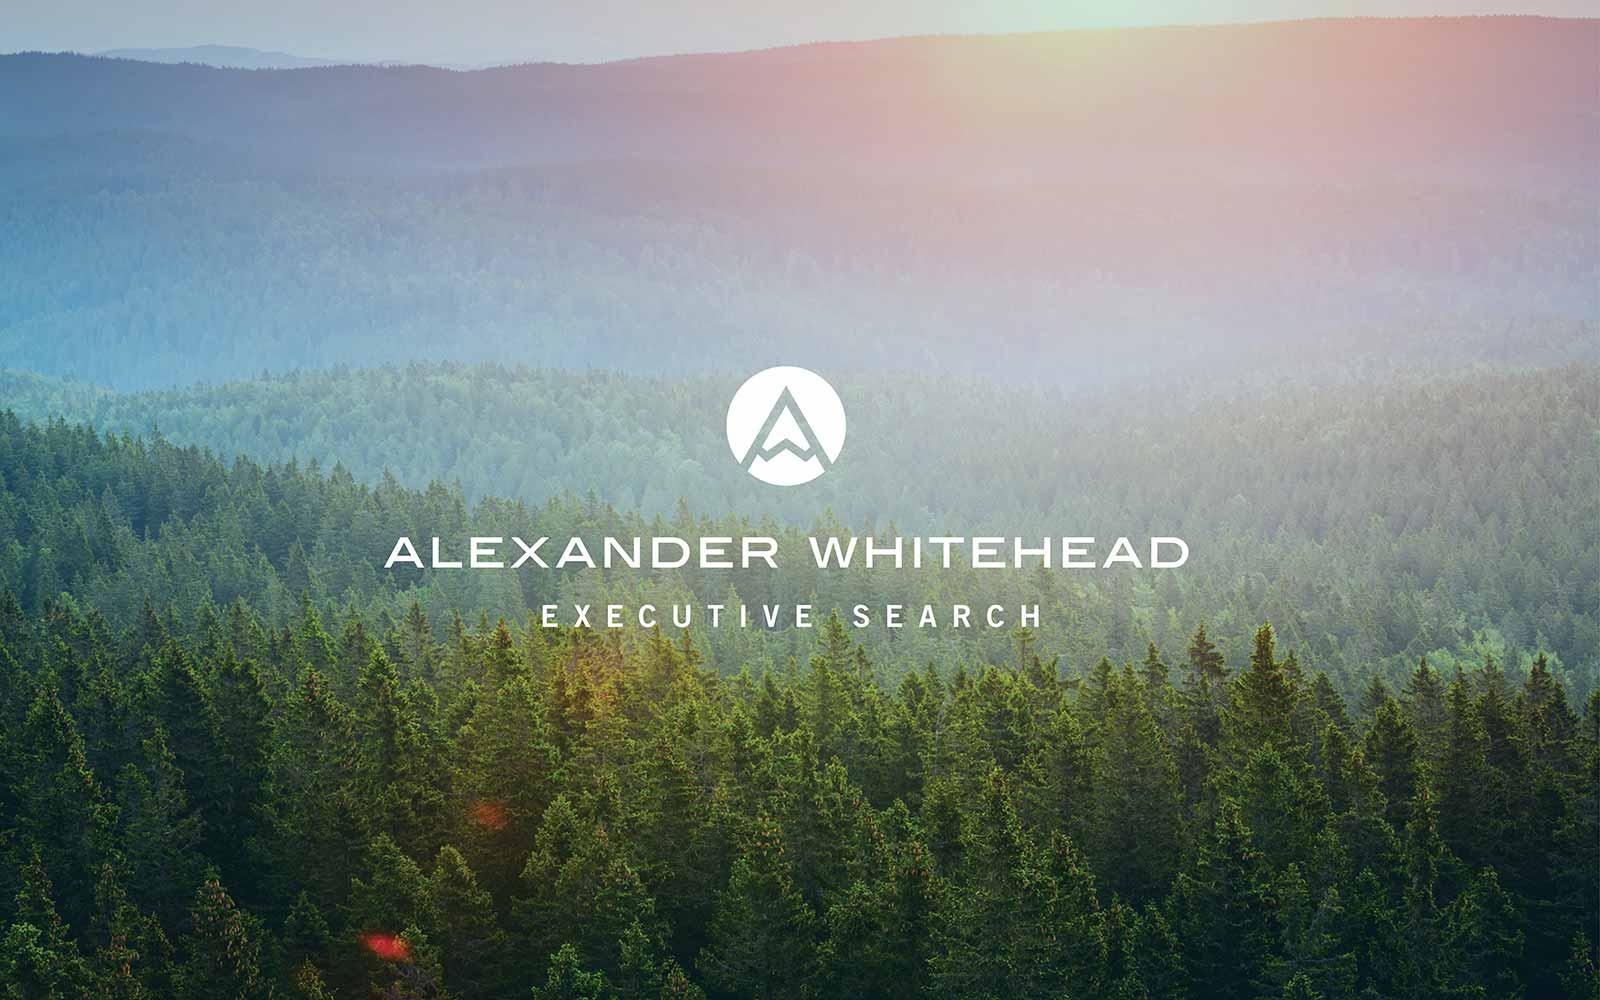 Alexander Whitehead Executive Search